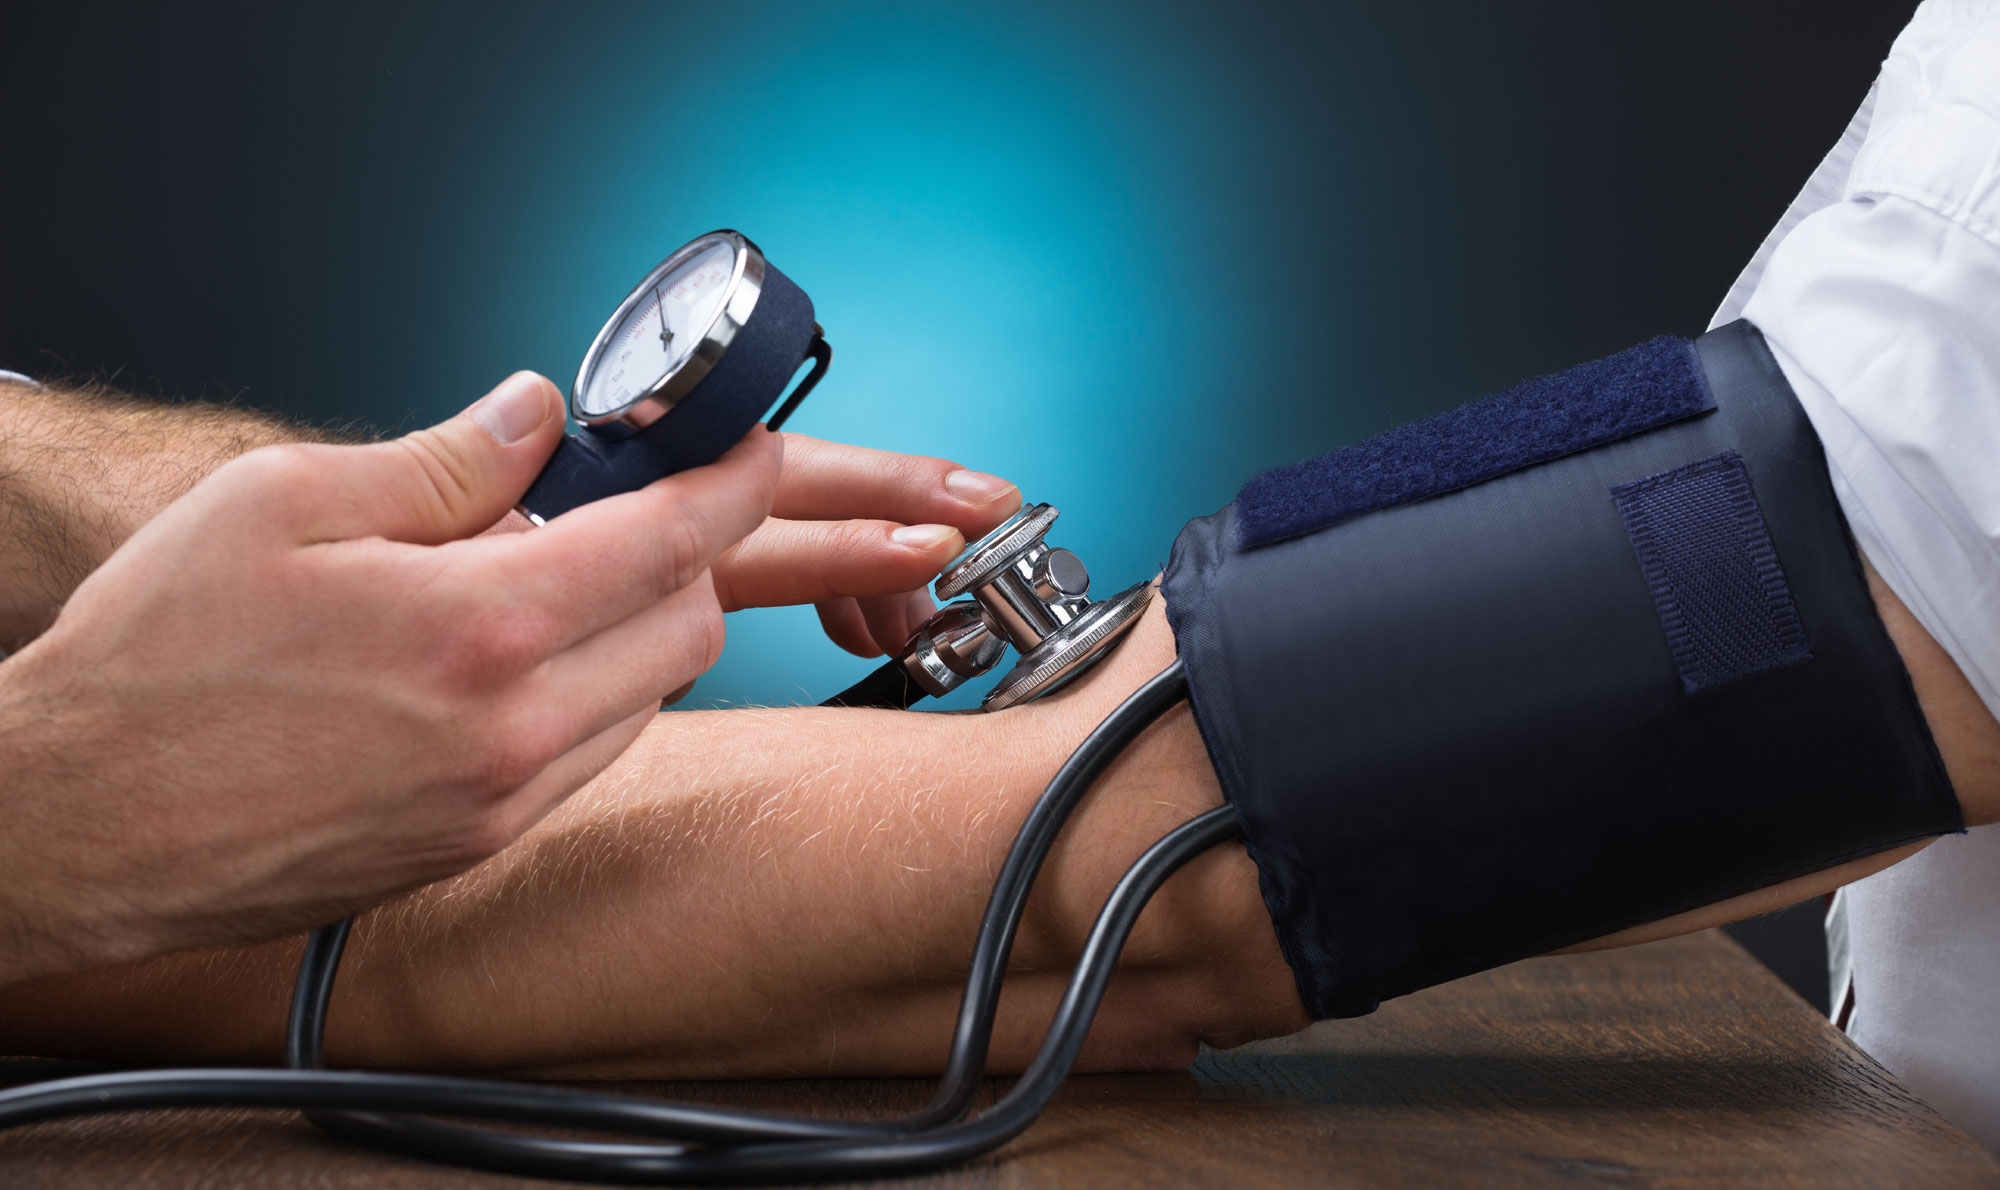 aktivnost na hipertenziju)